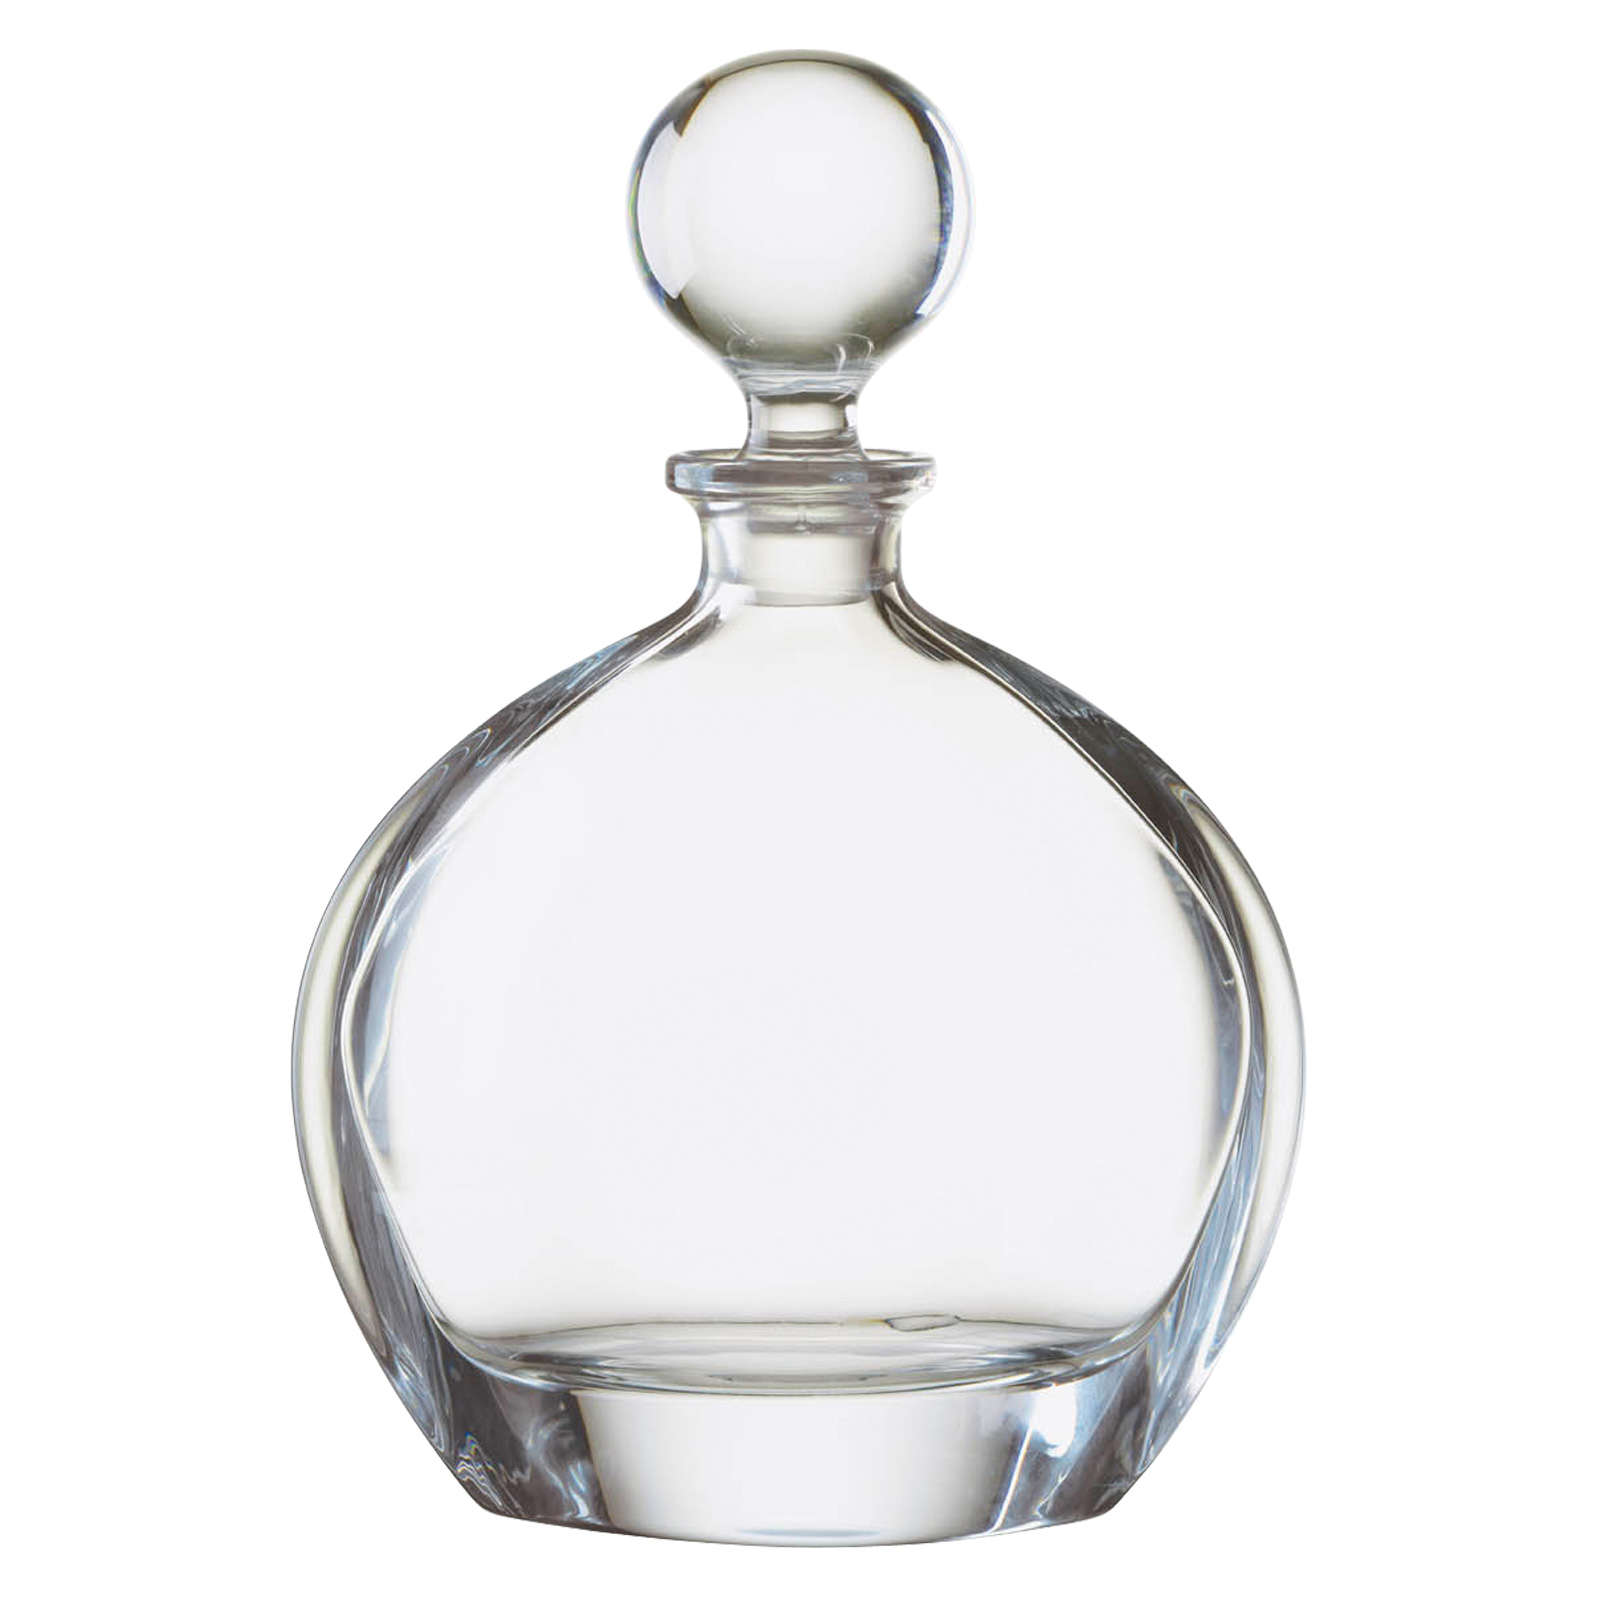 Orbit Whisky Decanter